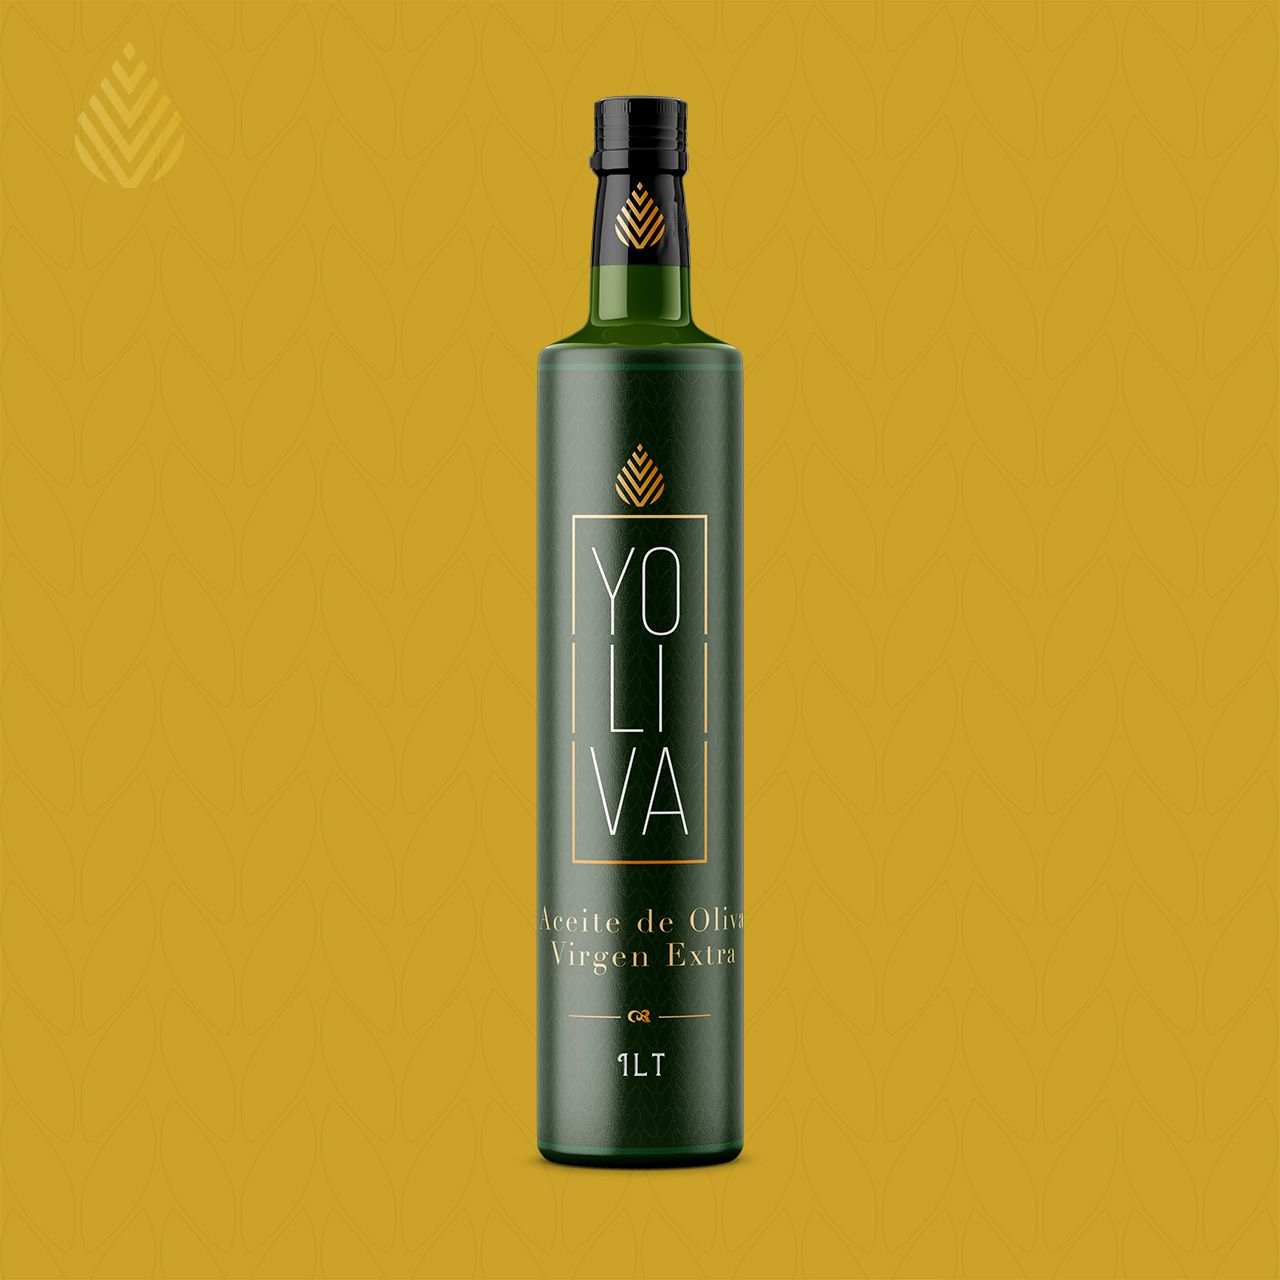 Botella de Aceite de Oliva Virgen extra diseño gourmet label etiqueta botella brandesign